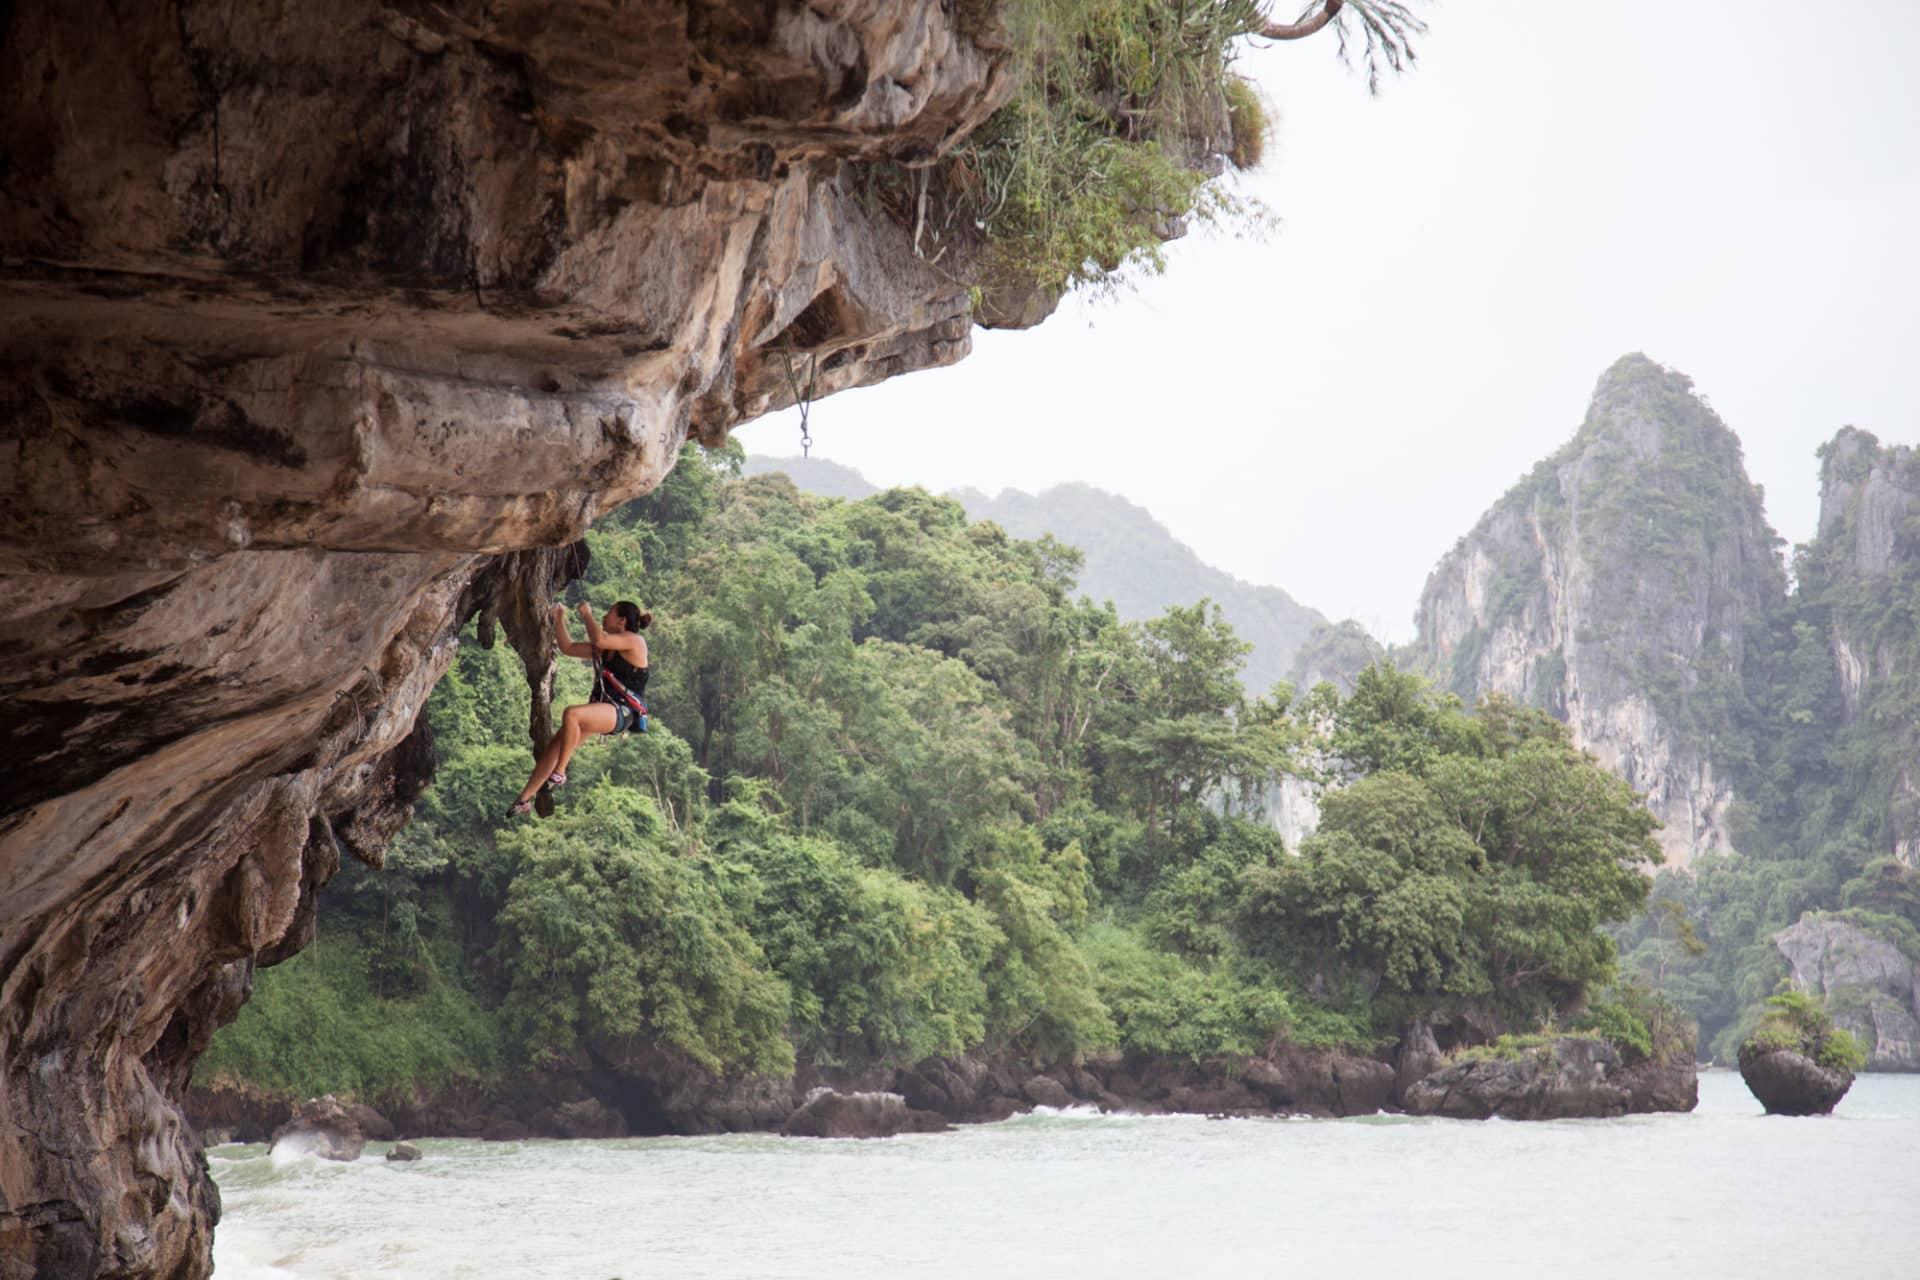 Full day rock climbing tours at Railay Beach, Thailand